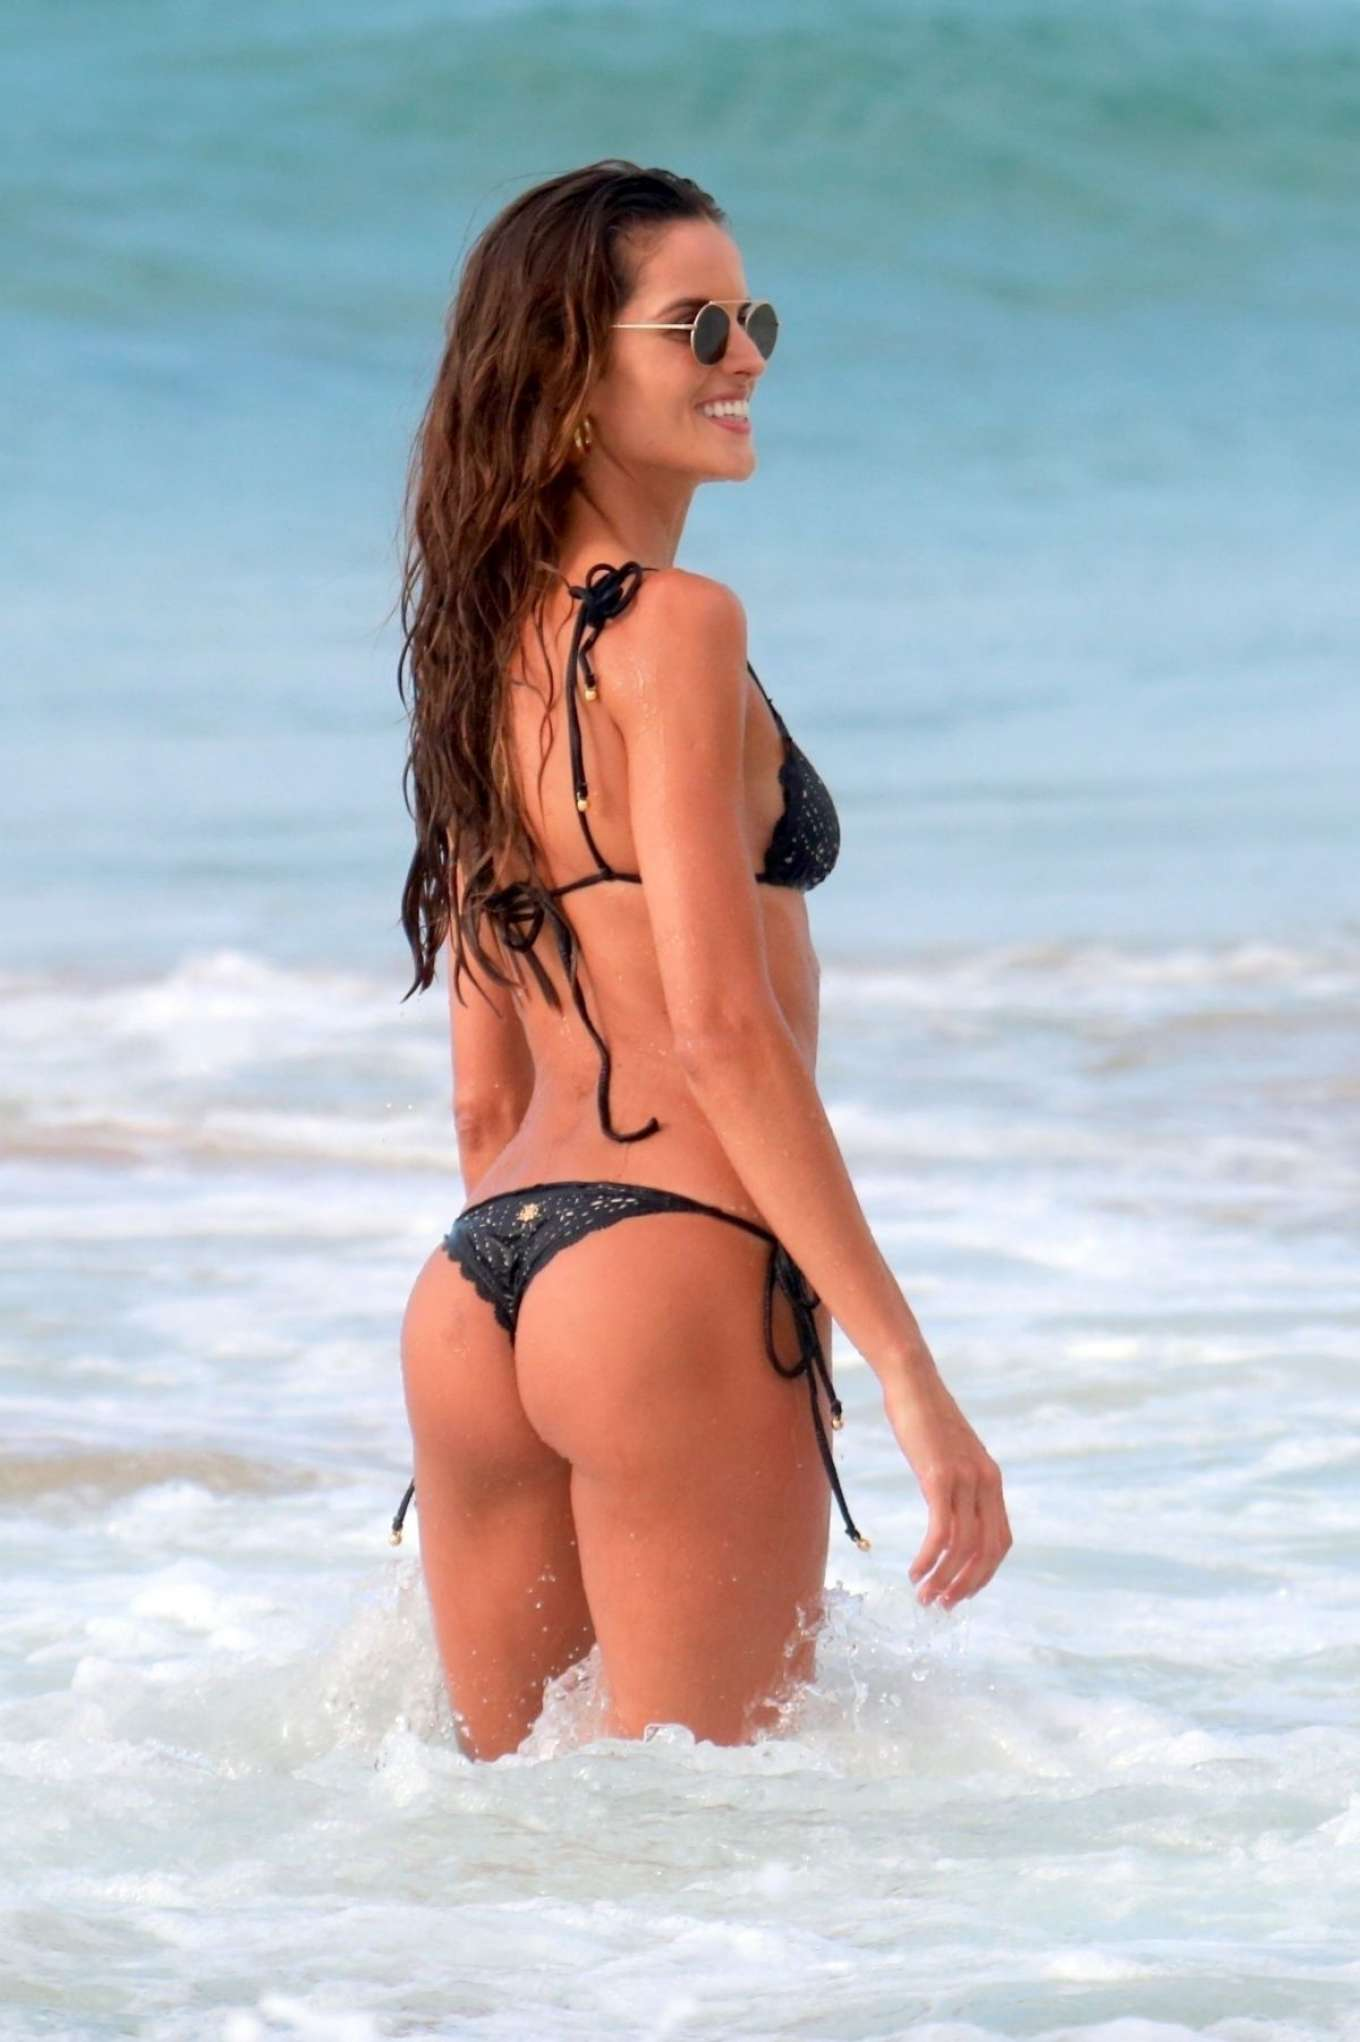 Izabel Goulart in Bikini at Cacimba Do Padre Beach in Fernando De Noronha Pic 5 of 35